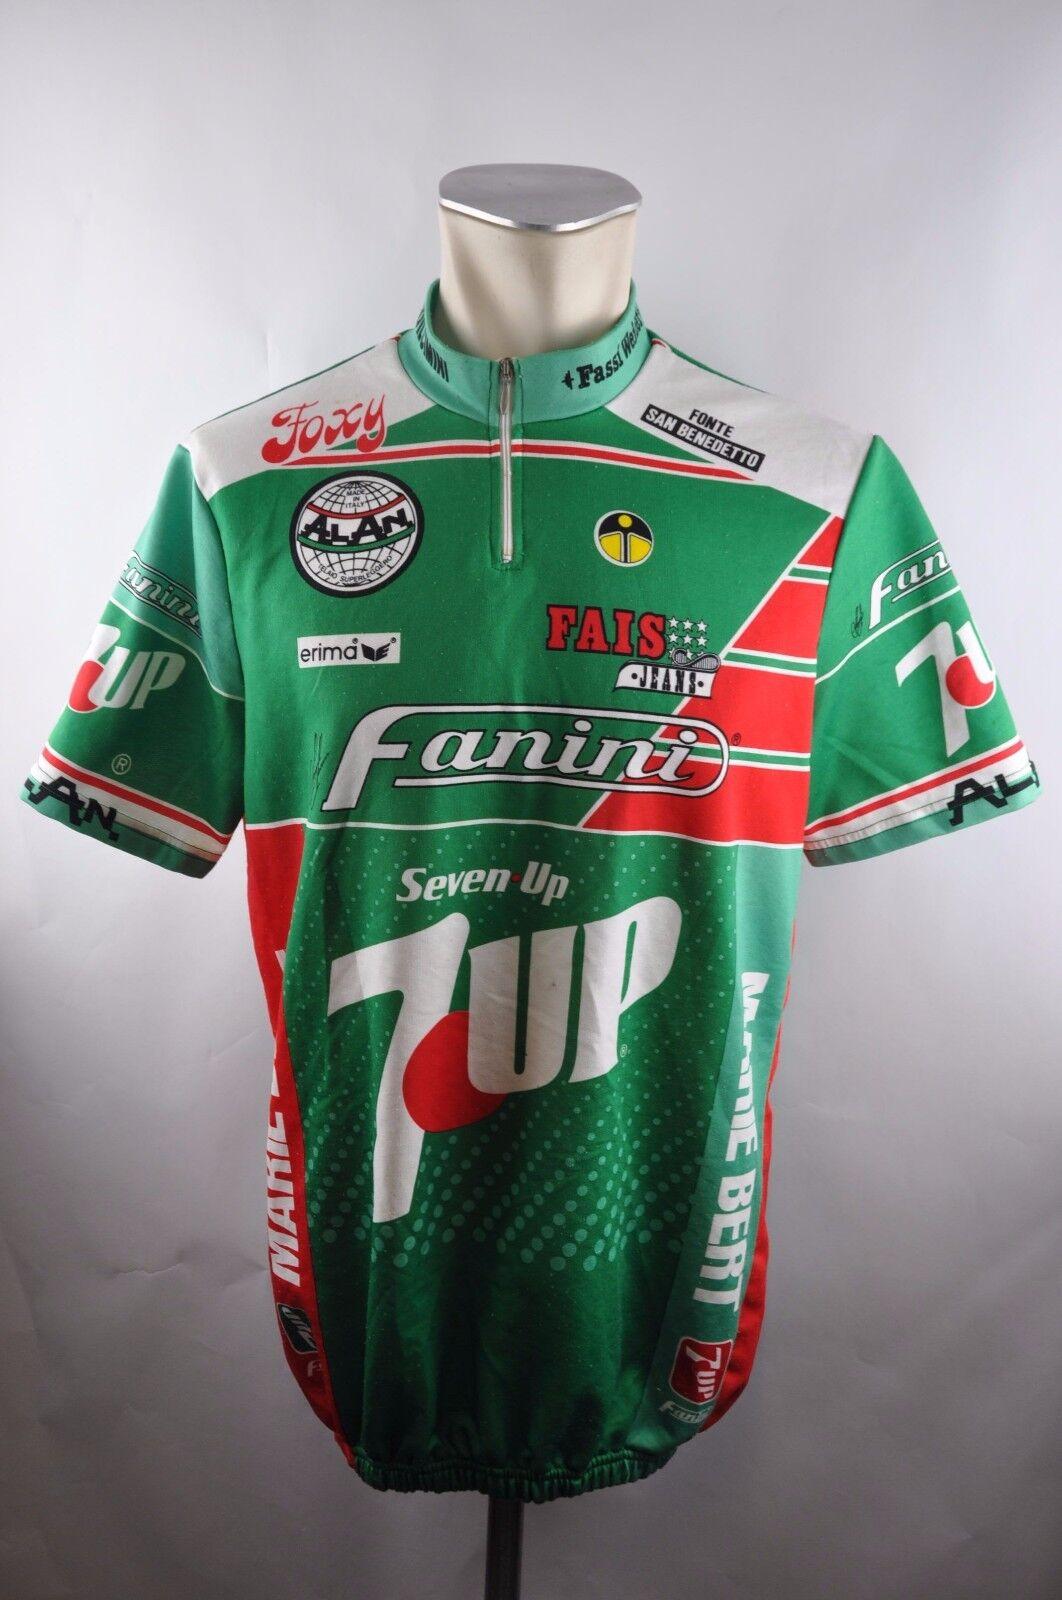 Erima 7up seven up vintage cycling jersey Bike Rad Trikot Trikot Trikot Gr. 7 58cm U5 | Qualität Produkte  884a9f